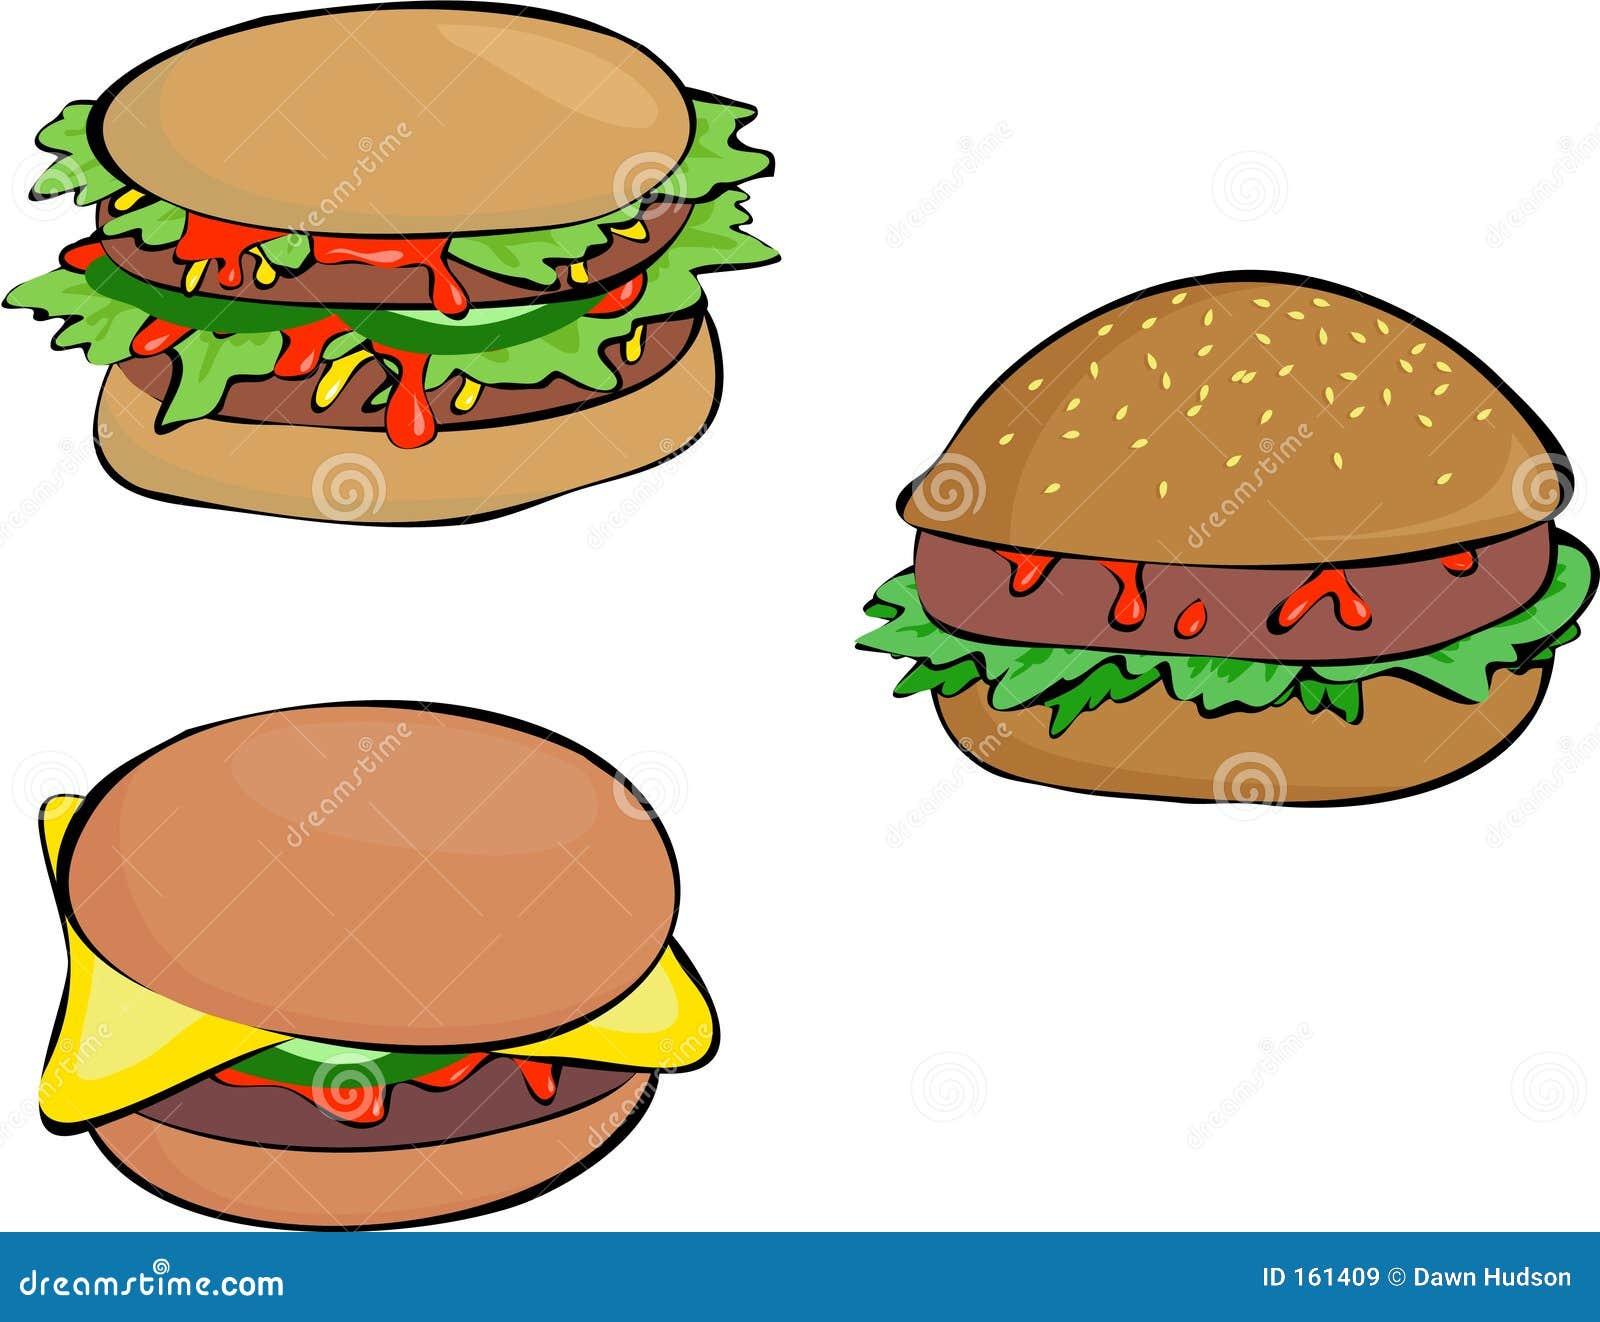 Beefburgers Cartoons, Illustrations & Vector Stock Images